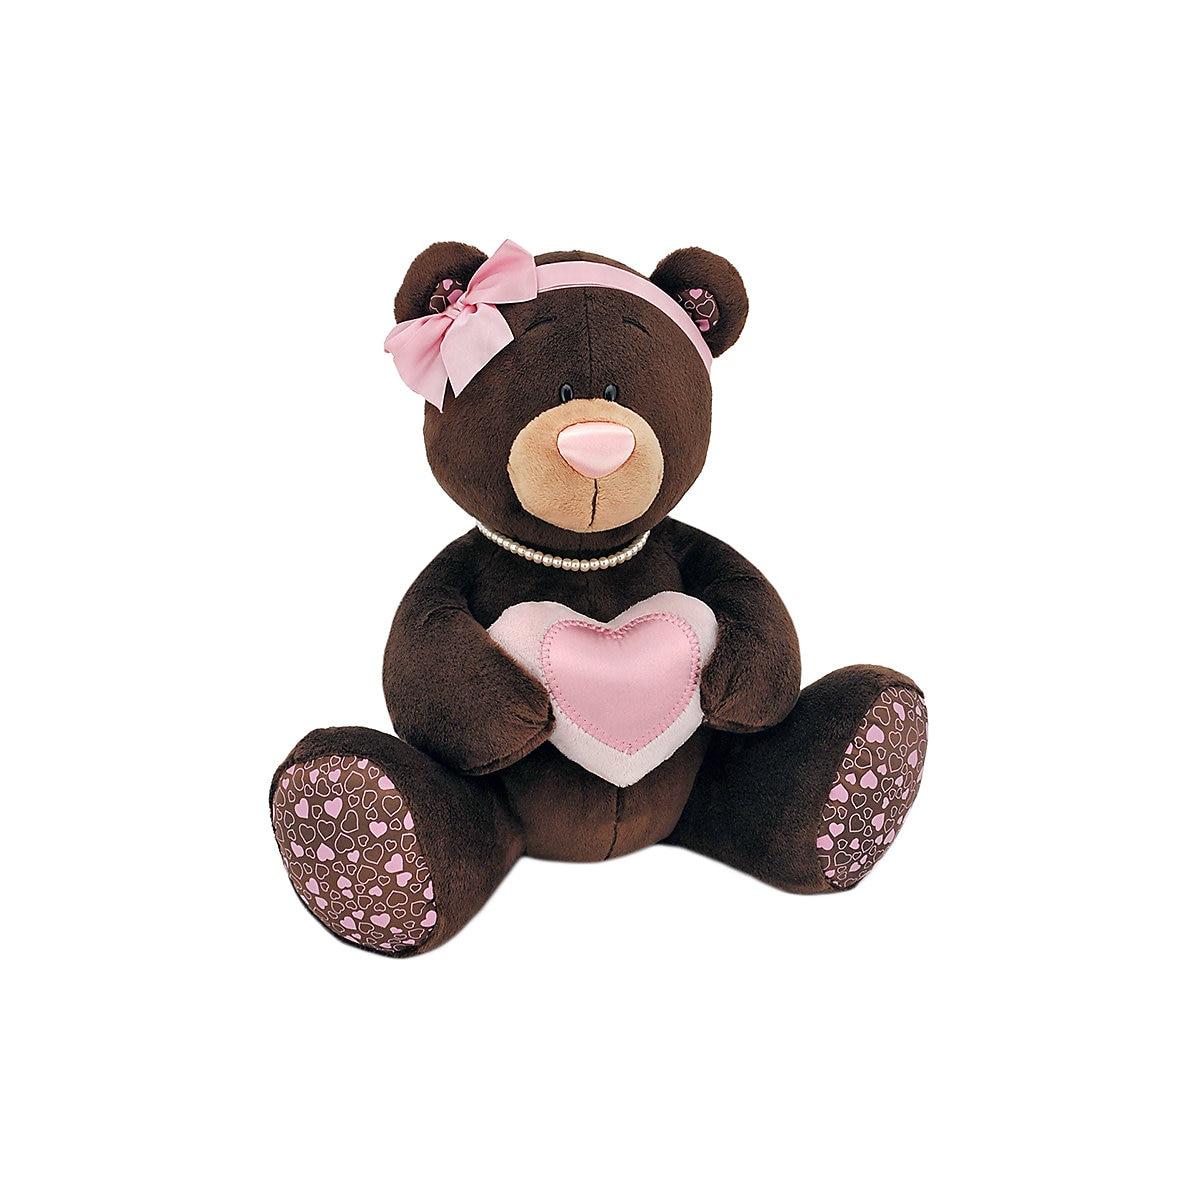 ORANGE TOYS Stuffed & Plush Animals 10694673 Soft Toy Friend Animal Girl Boy Play Game Girls Boys